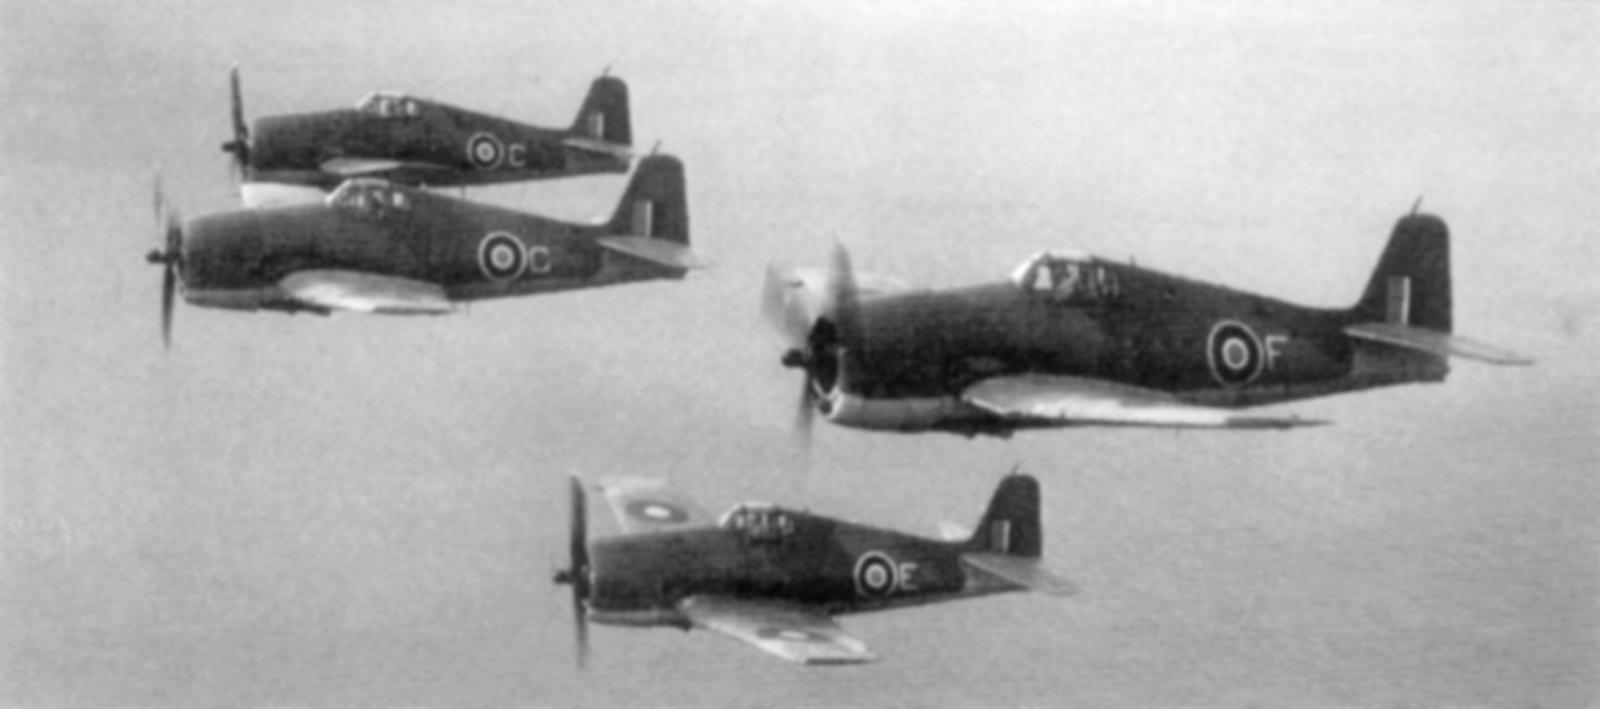 Grumman F6F 3 Hellcat RN 800NAS C Englinton 1943 01